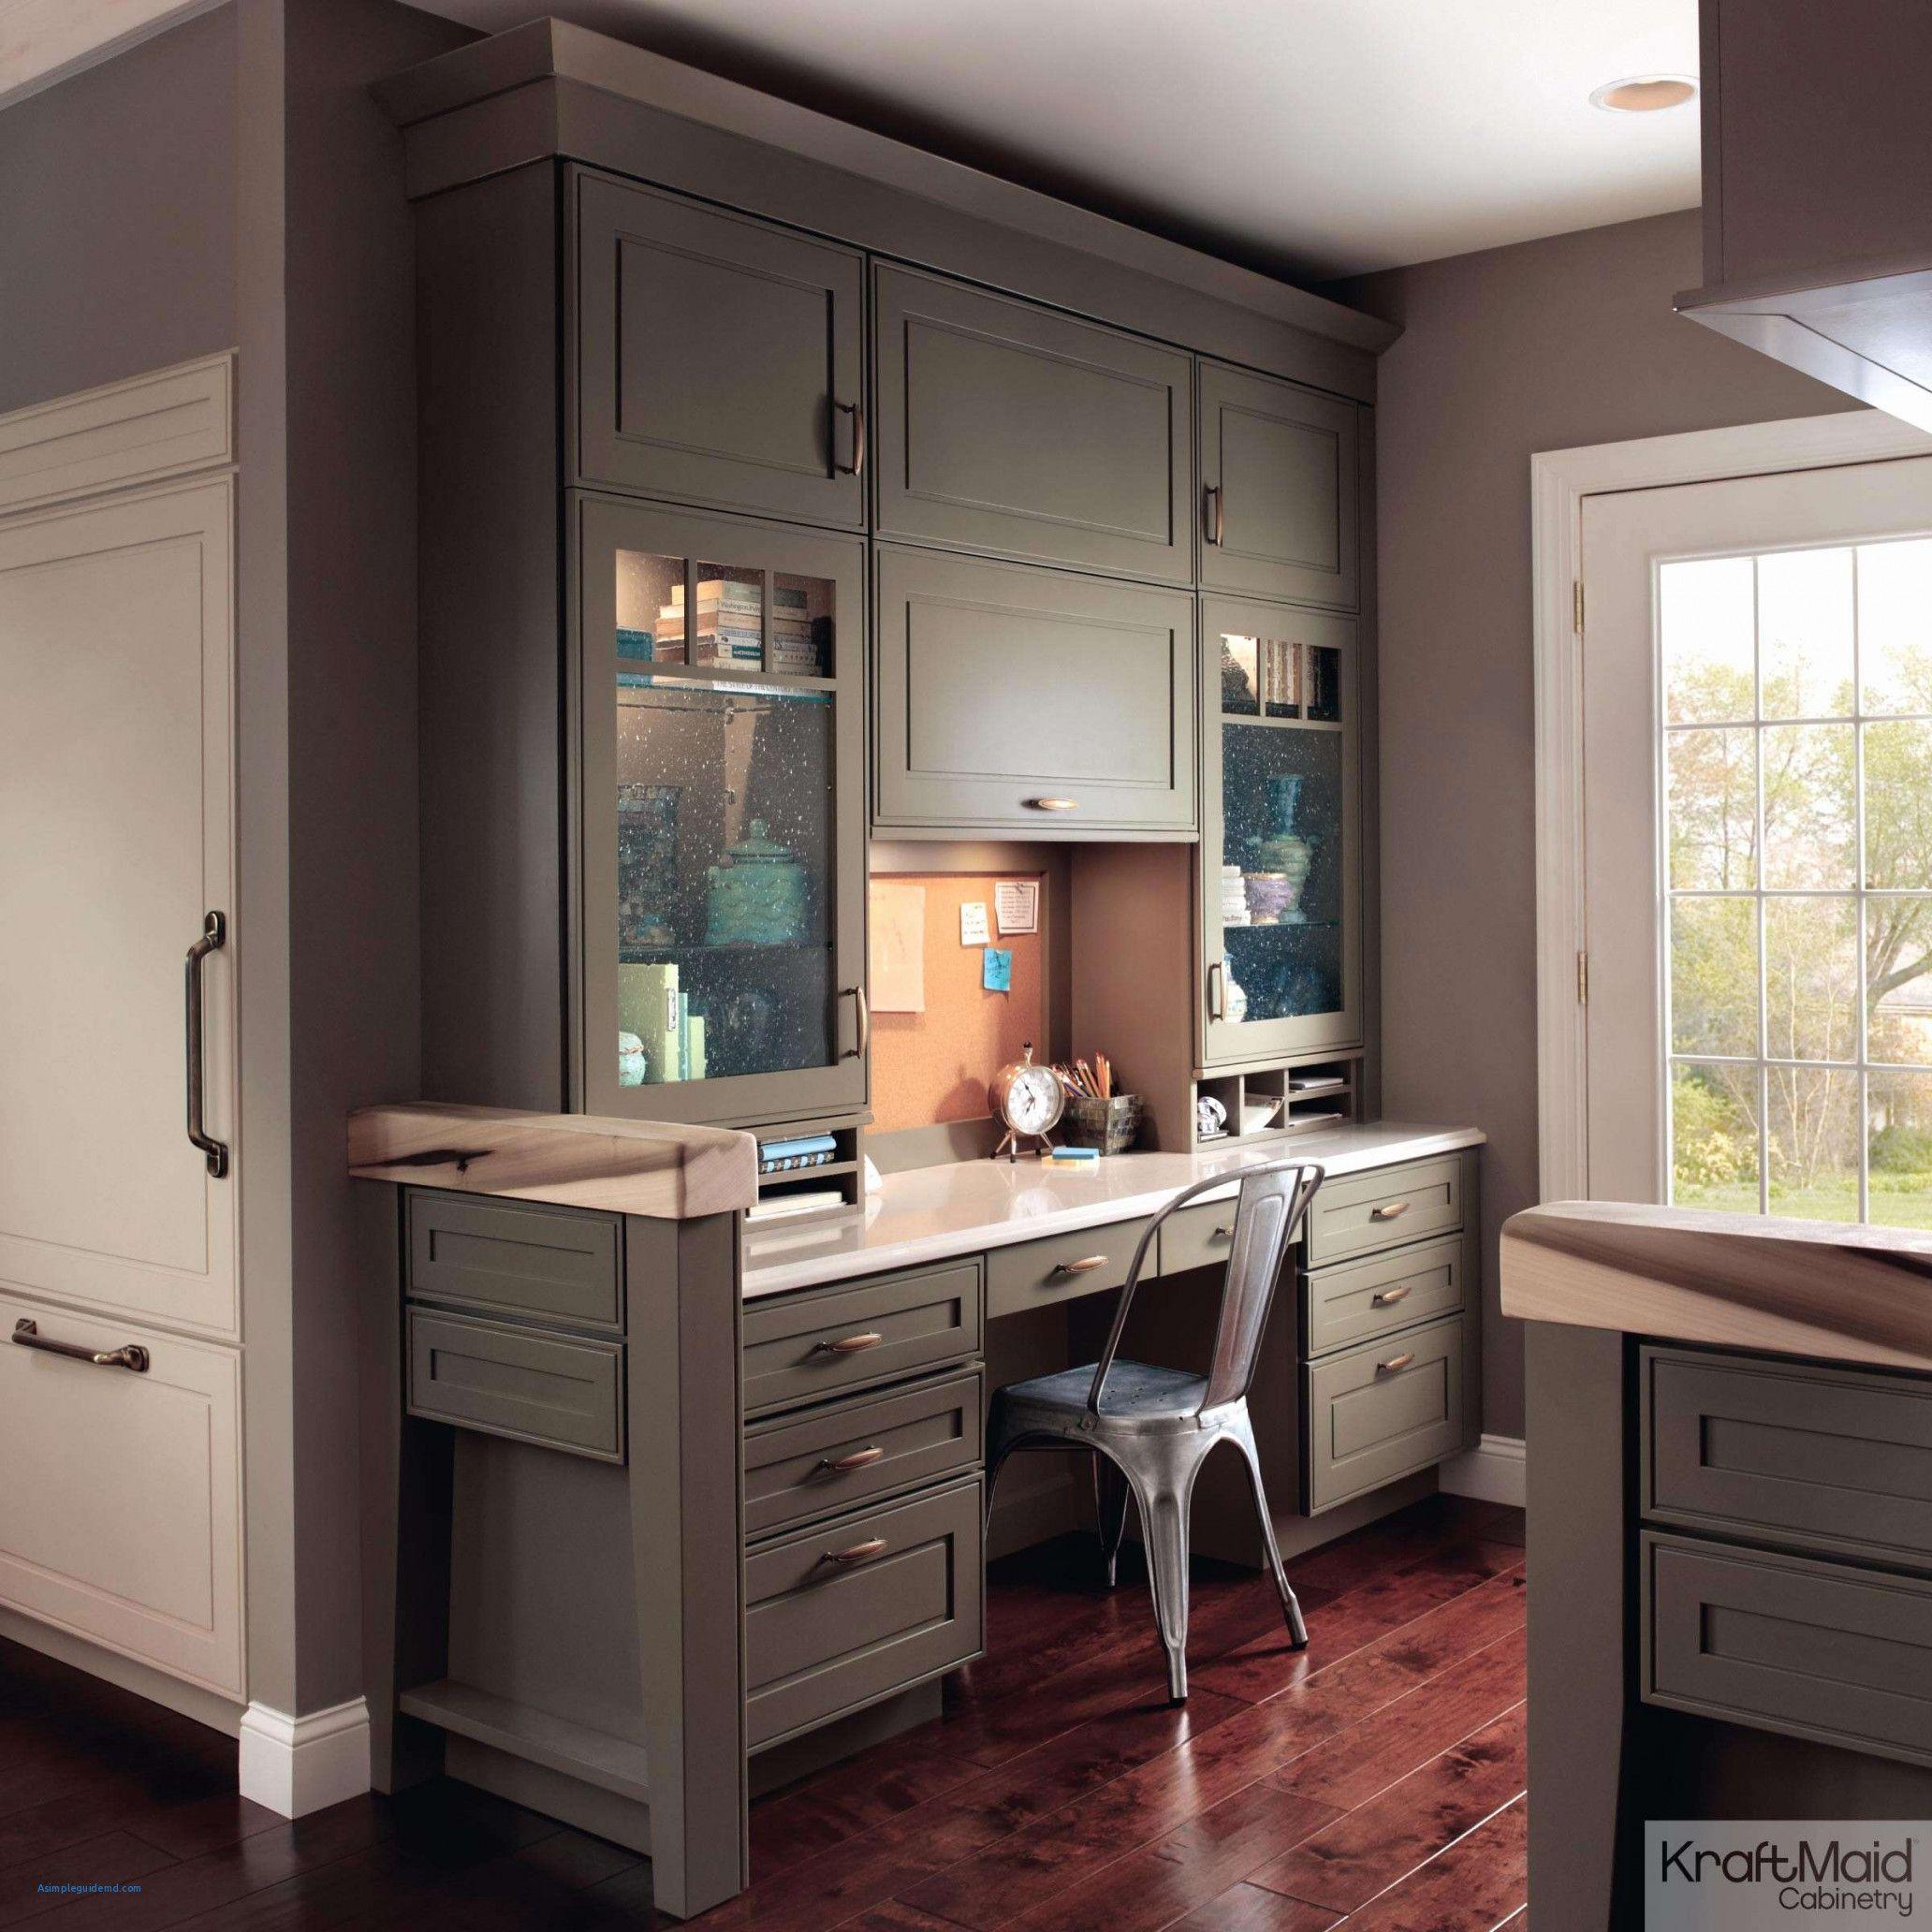 Inspirational Kitchen Cabinets Reno Nv Beautiful Kitchen Cabinets Kitchen Cabinet Design Glass Kitchen Cabinets